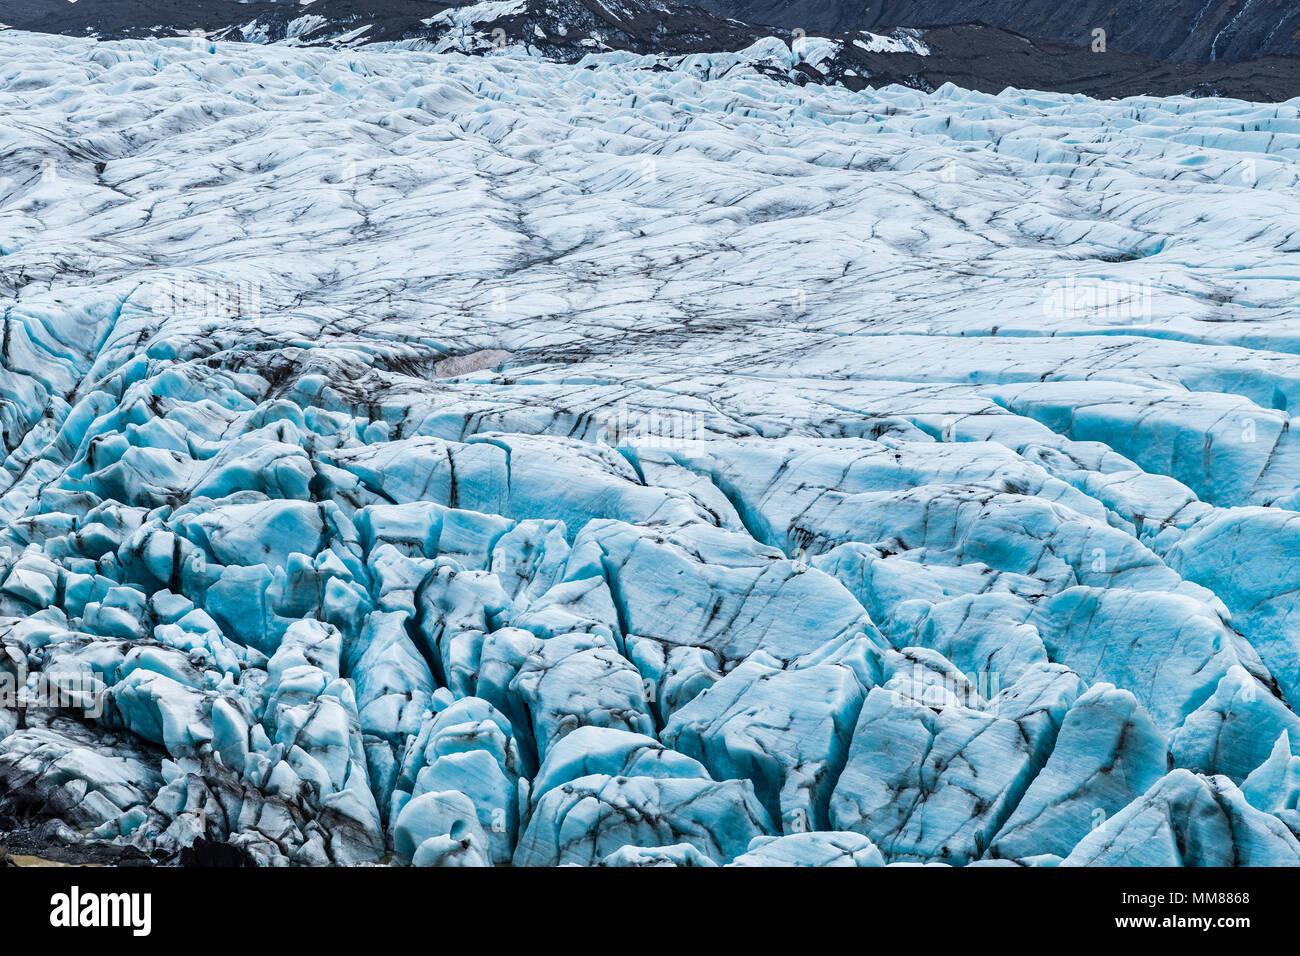 Svinafellsjokull Glacier, Iceland which has featured in Game of Thrones, Interstellar and Batman Begins - Stock Image